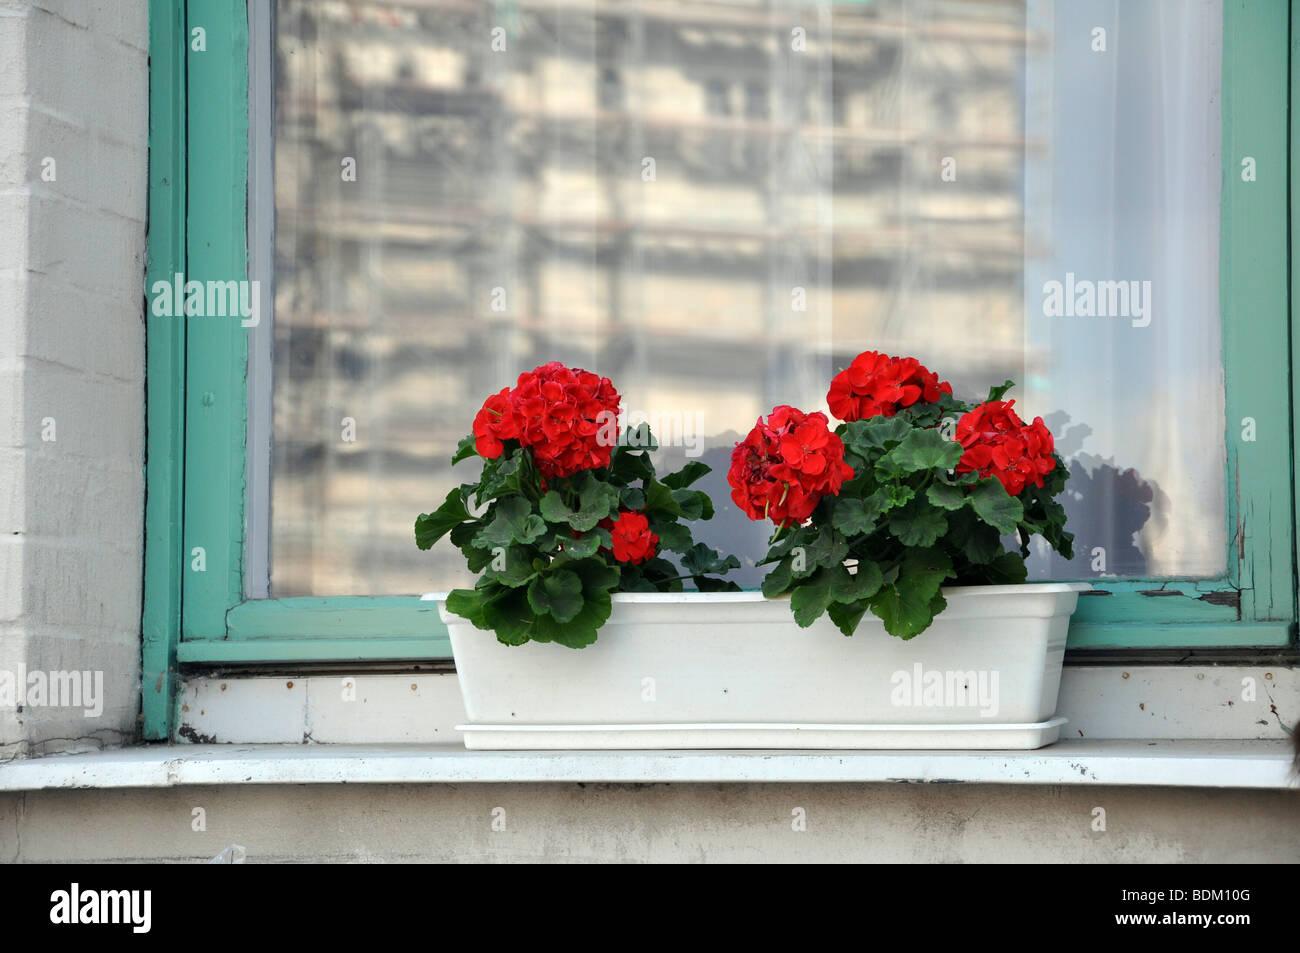 Eastern Europe, Hungary, Budapest, red Geranium flowers on a windowsill - Stock Image